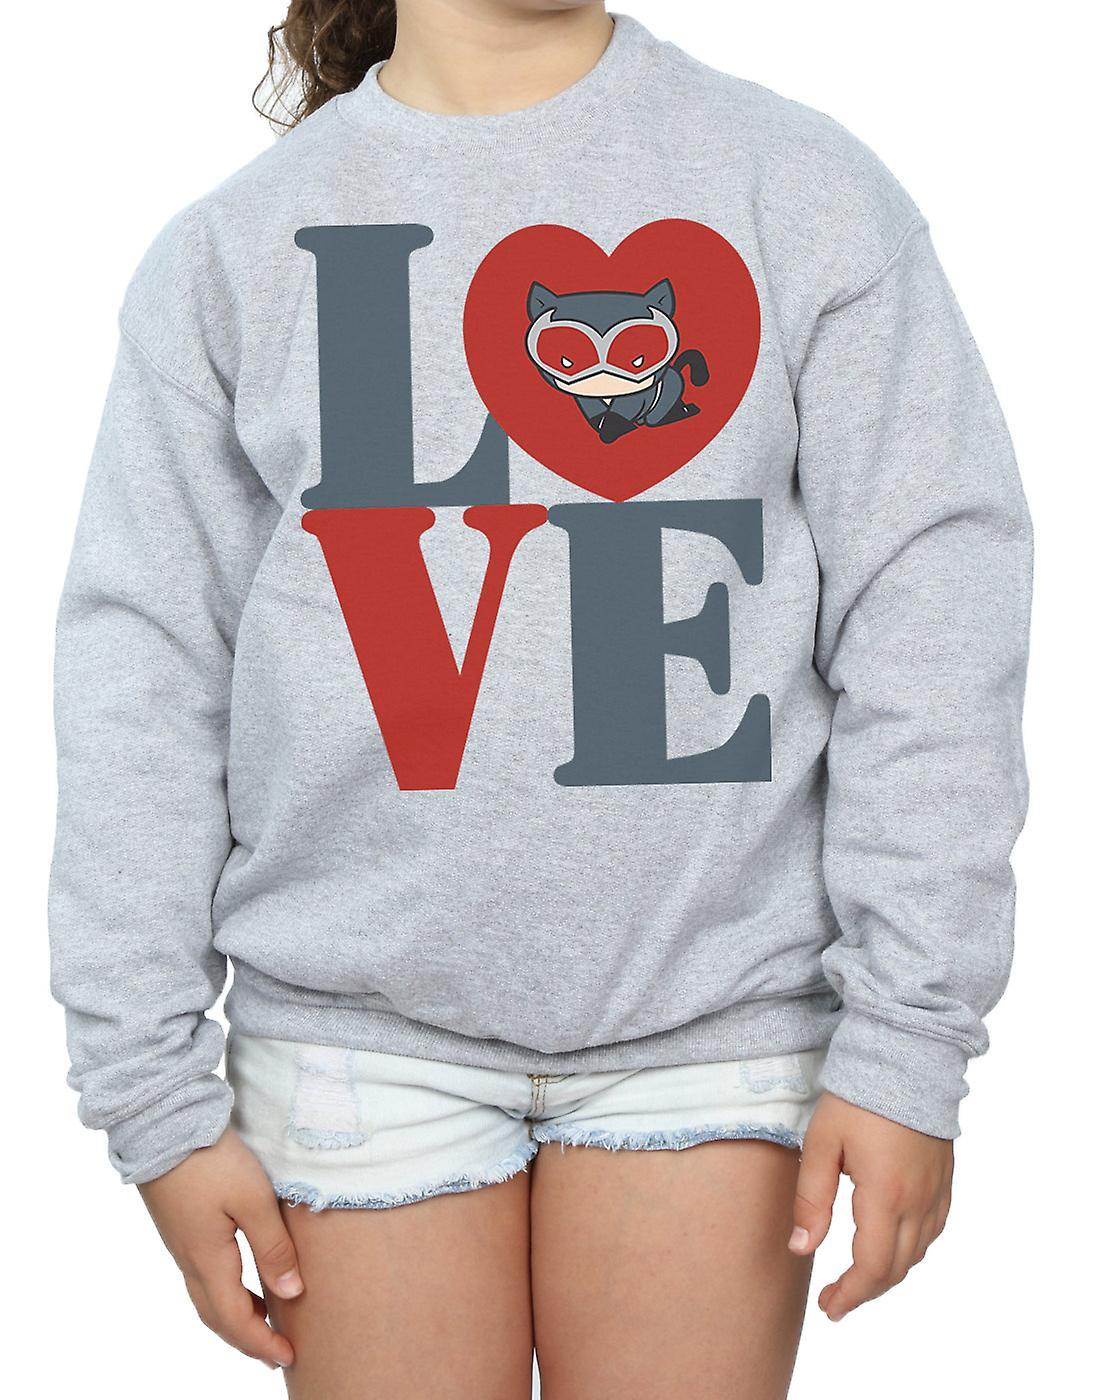 DC Comics filles Chibi Catwoman amour Sweatshirt